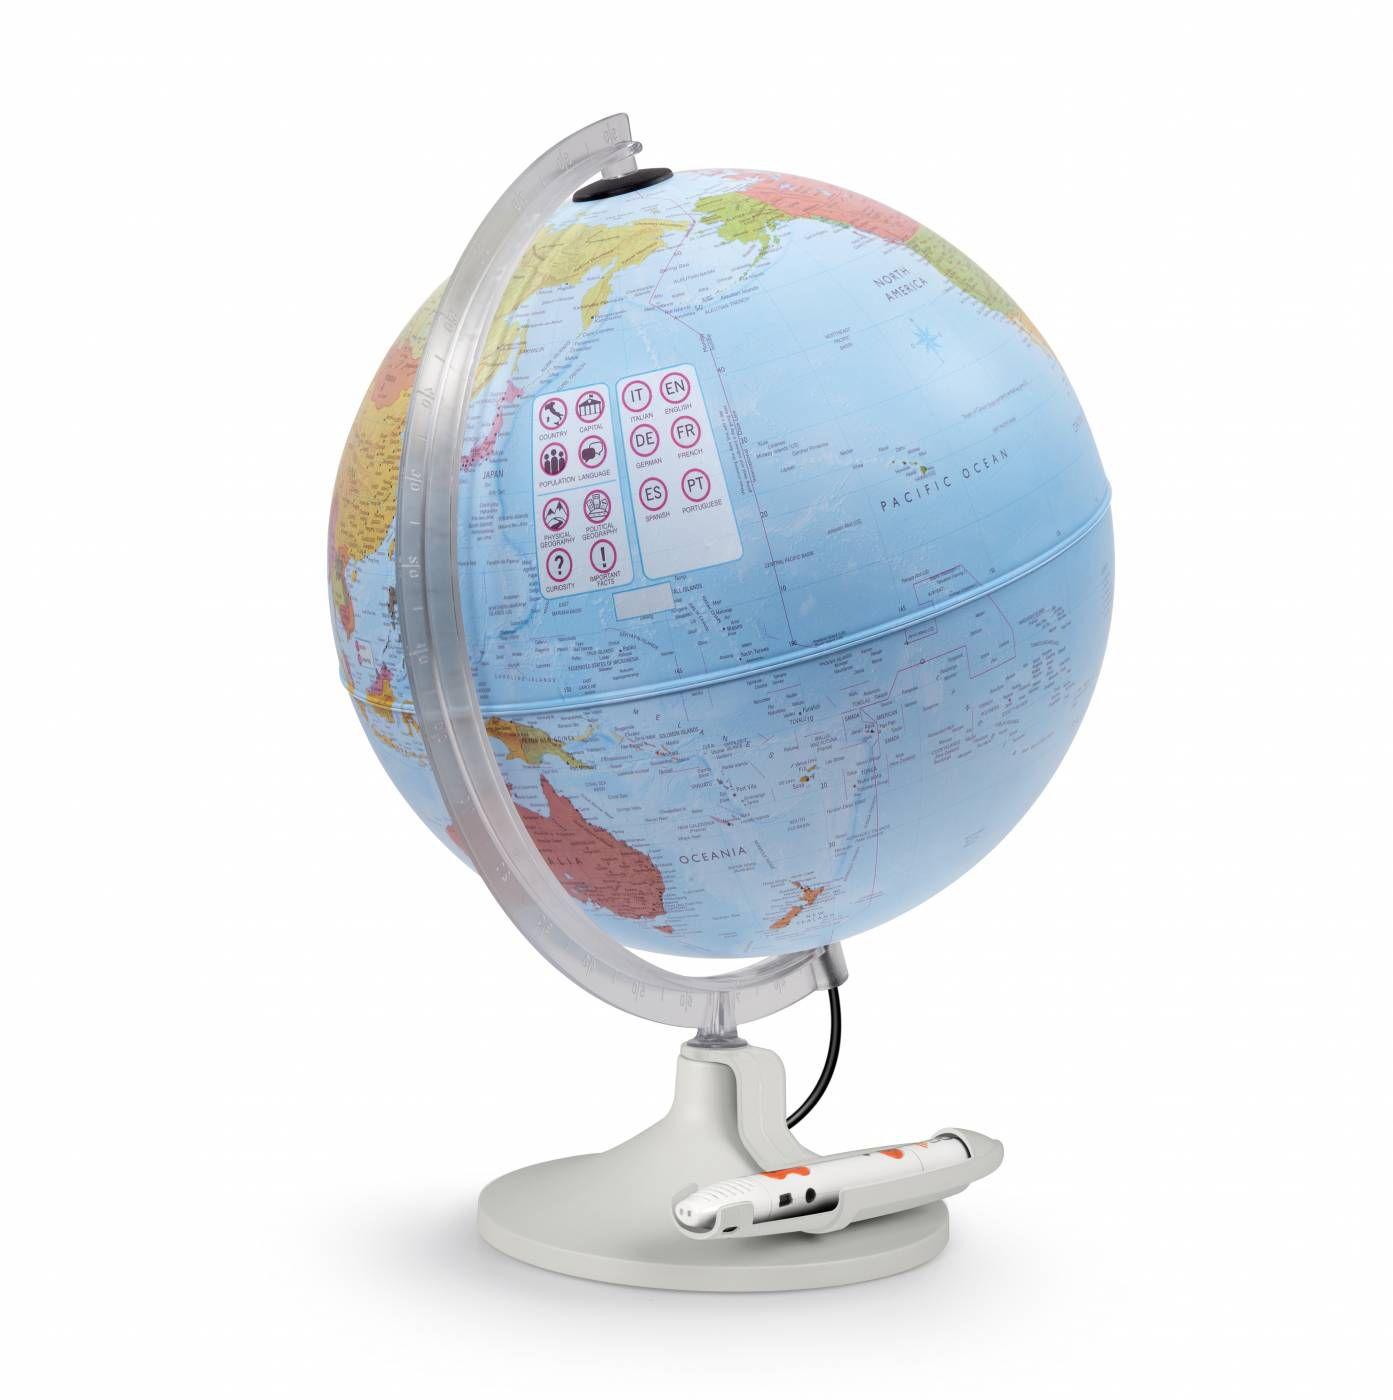 Globo geográfico Tecnodidattica Parlamondo